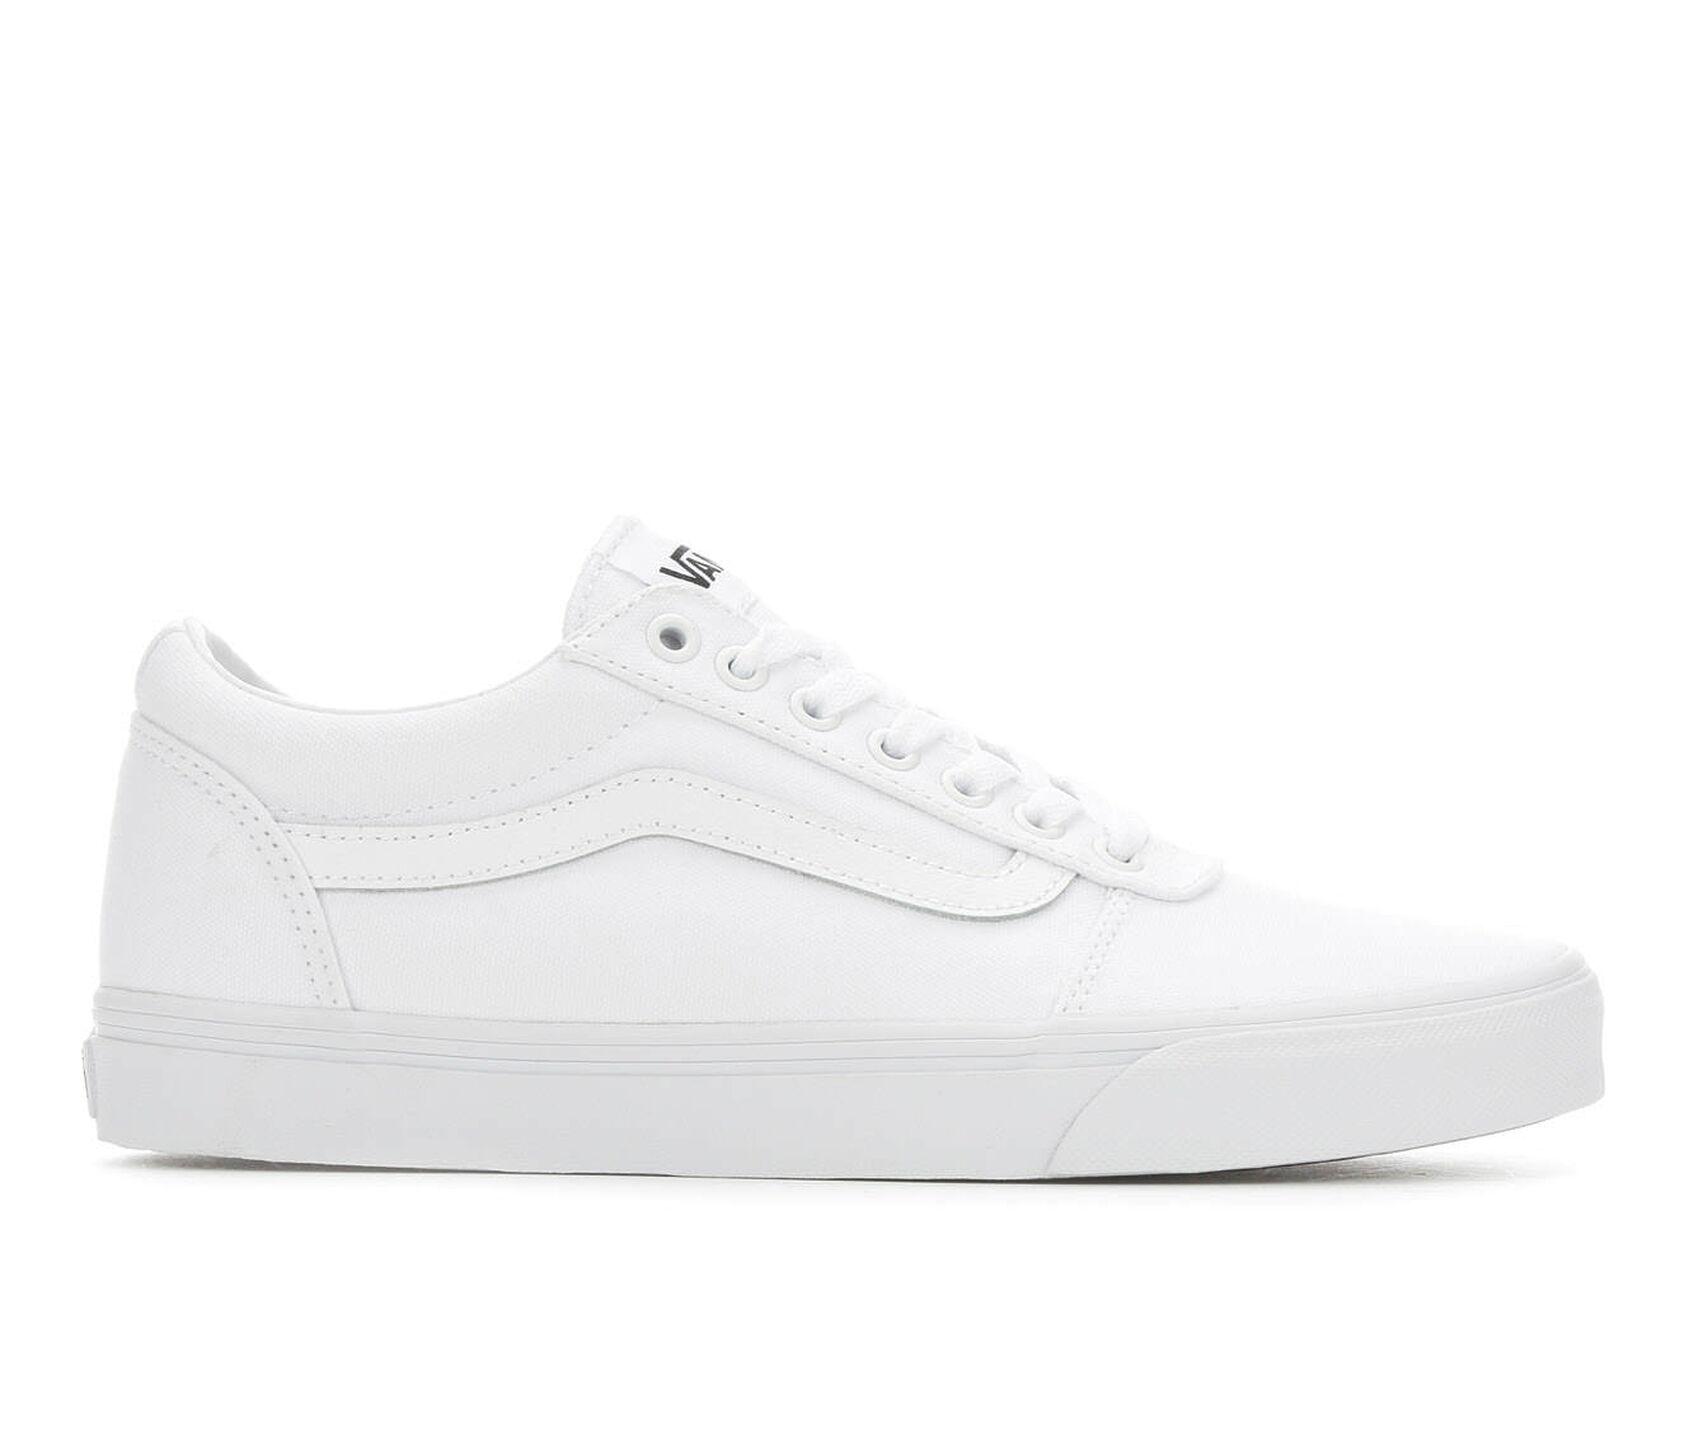 eb7a49918 Men's Vans Ward Skate Shoes | Shoe Carnival